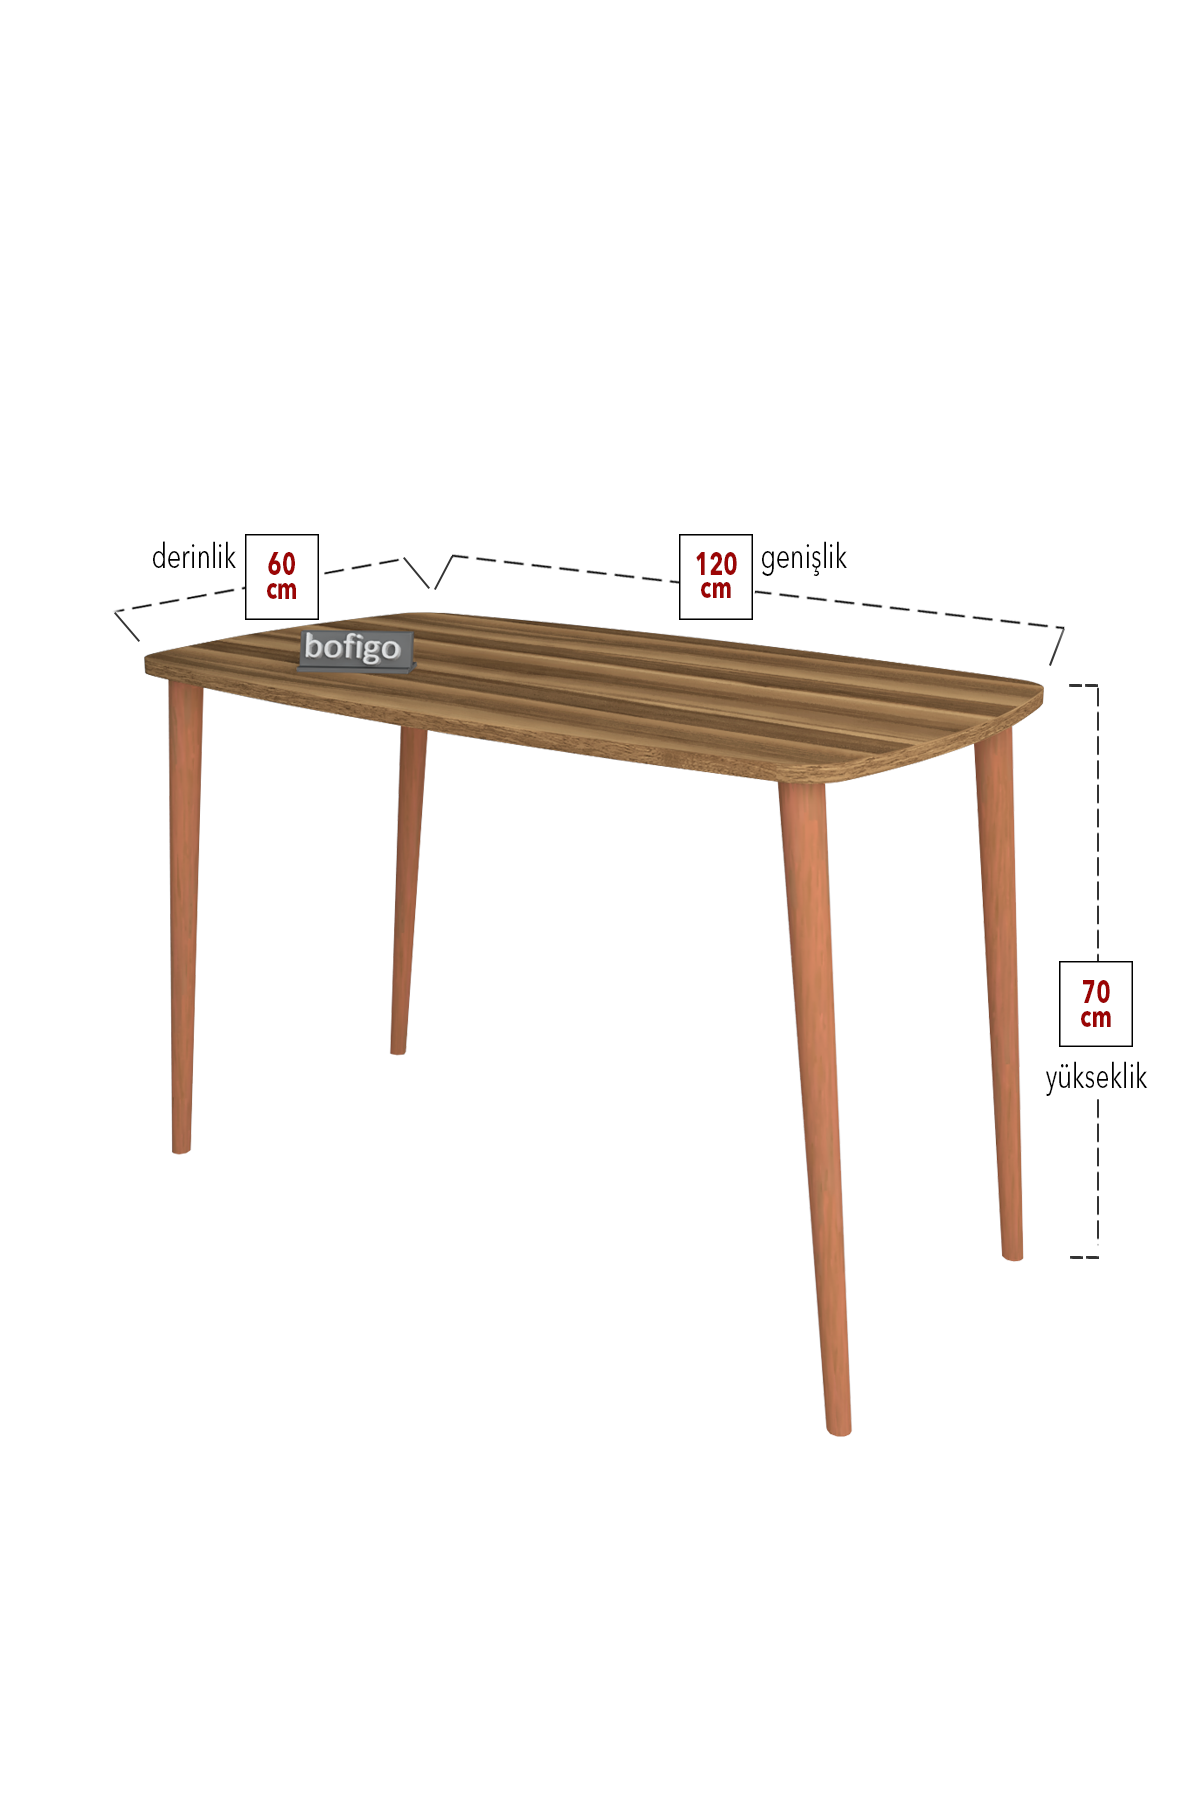 Bofigo Desk 60x105 Cm Walnut (Wooden Leg)